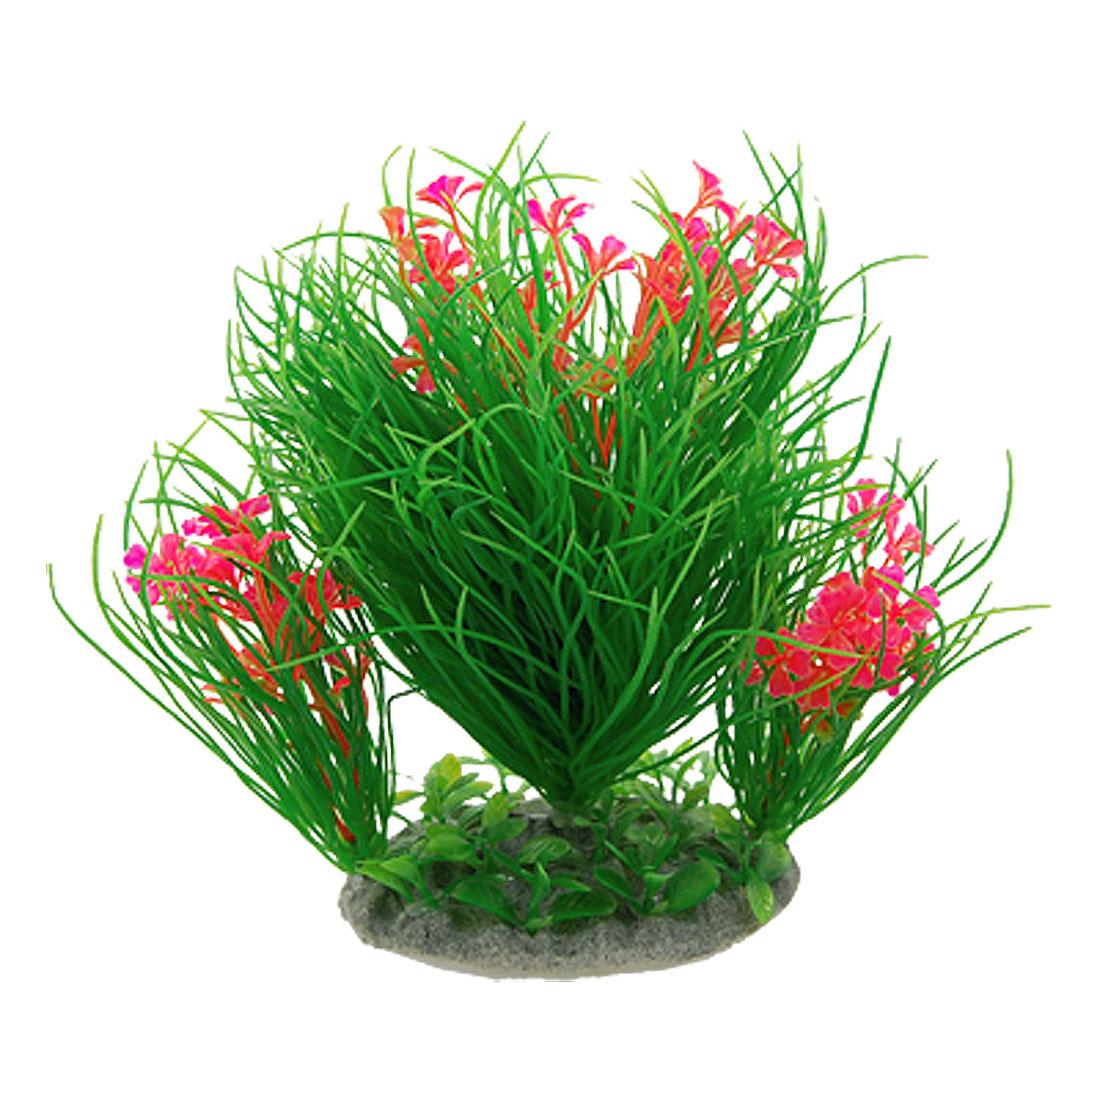 Aquarium Plastic Hot Pink Flower Green Needlelike Plants Ornament